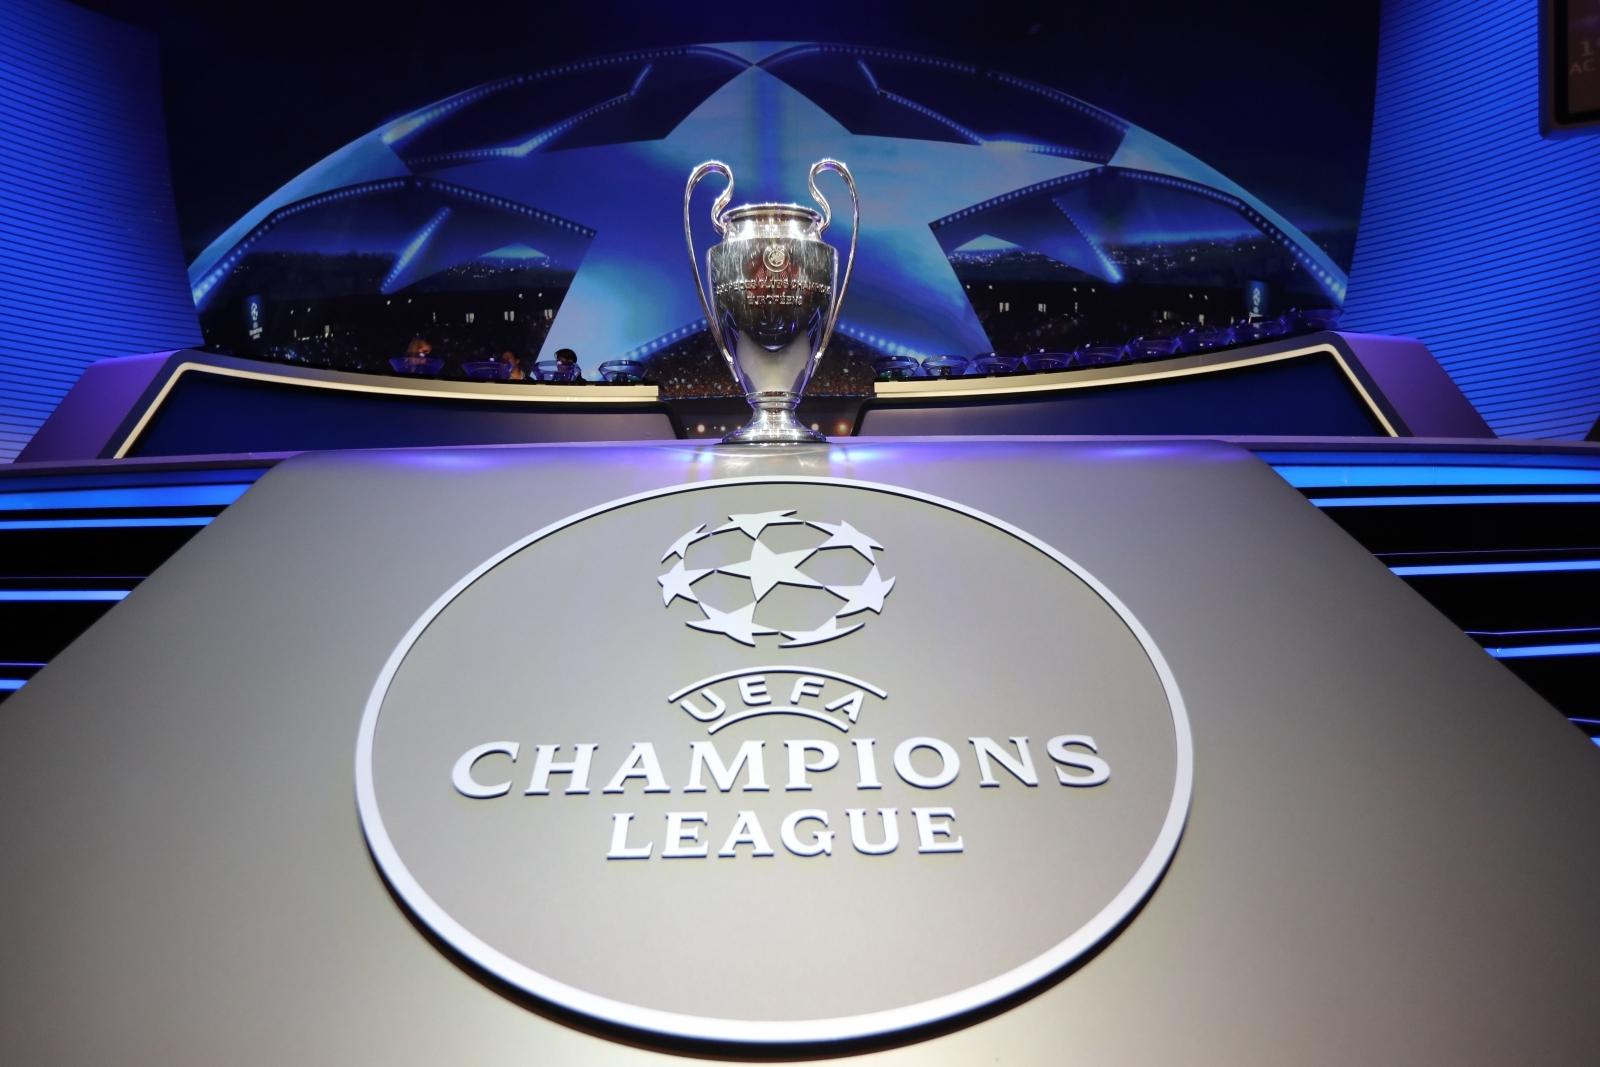 Chelsea 16 League Champions -  Uefa draw last handed